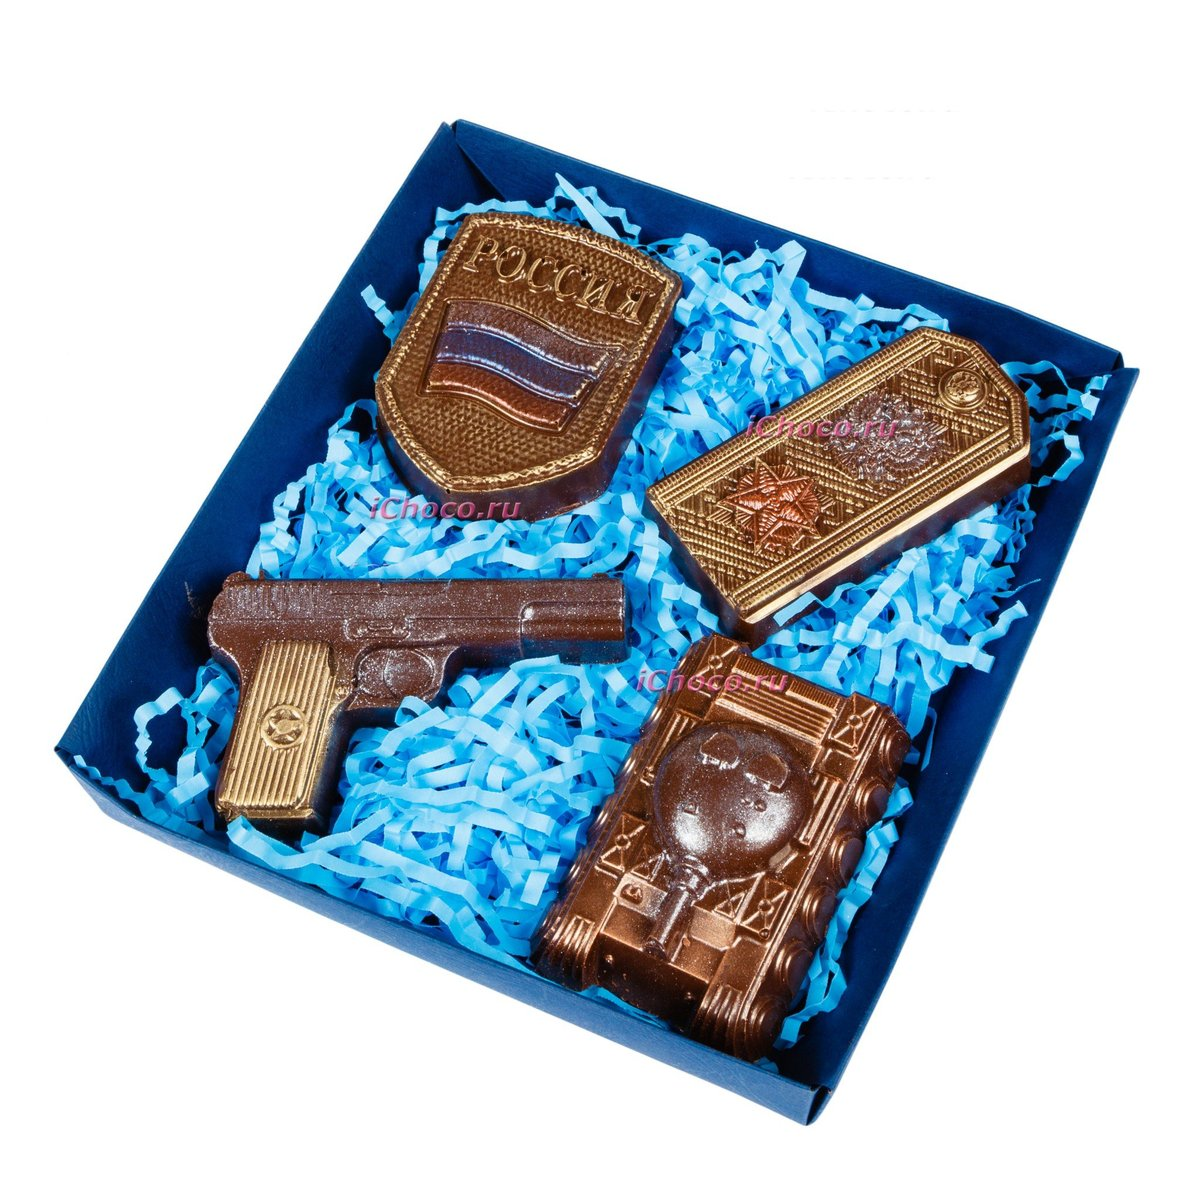 шоколадки с фото на заказ щелково эти фоточки